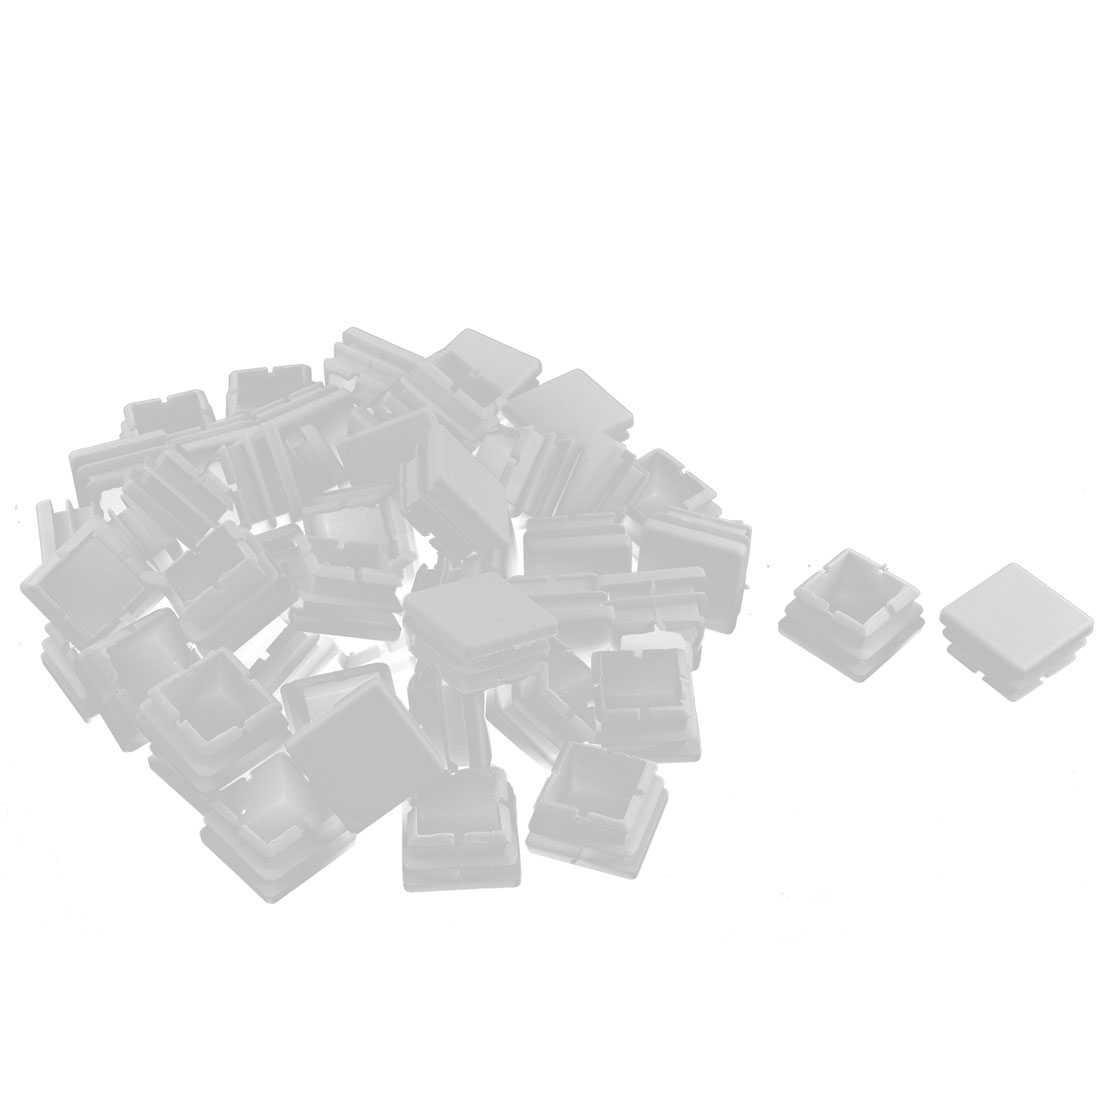 Plastic Square Tube Pipe Inserts End Blanking Caps White 25mmx25mm 50 Pcs